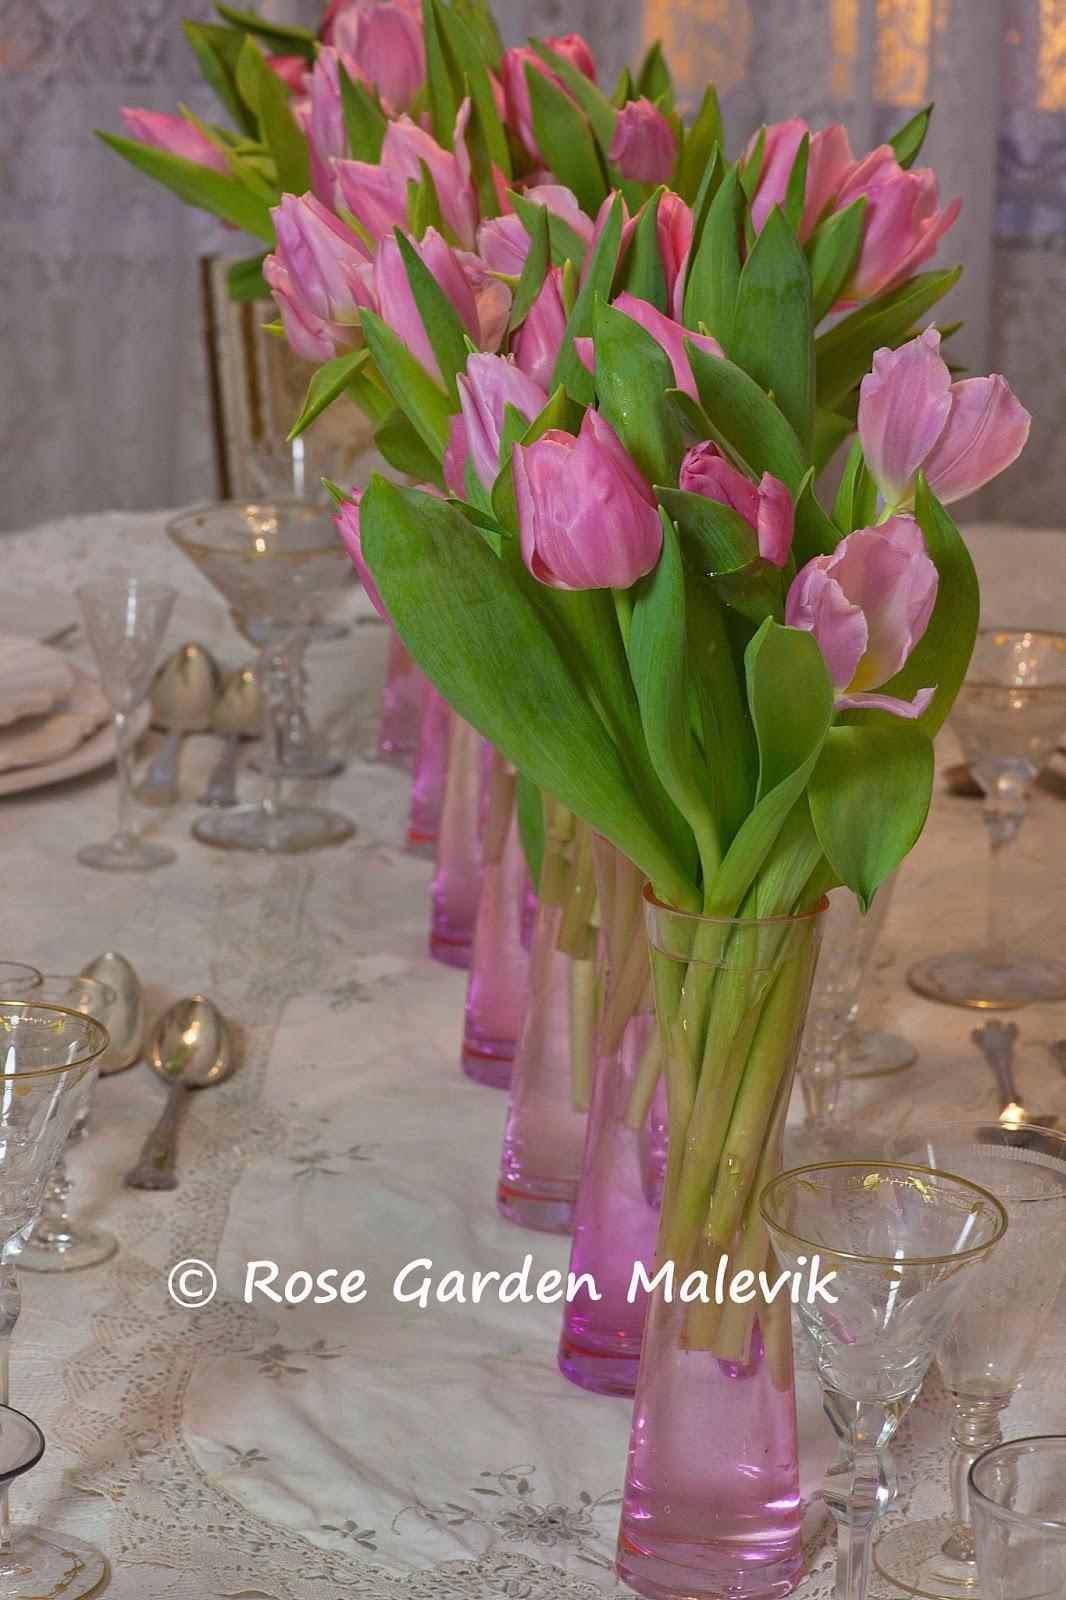 ROSE GARDEN Malevik: Arrangera Tulpaner ~ Arrangemensts for Tulips